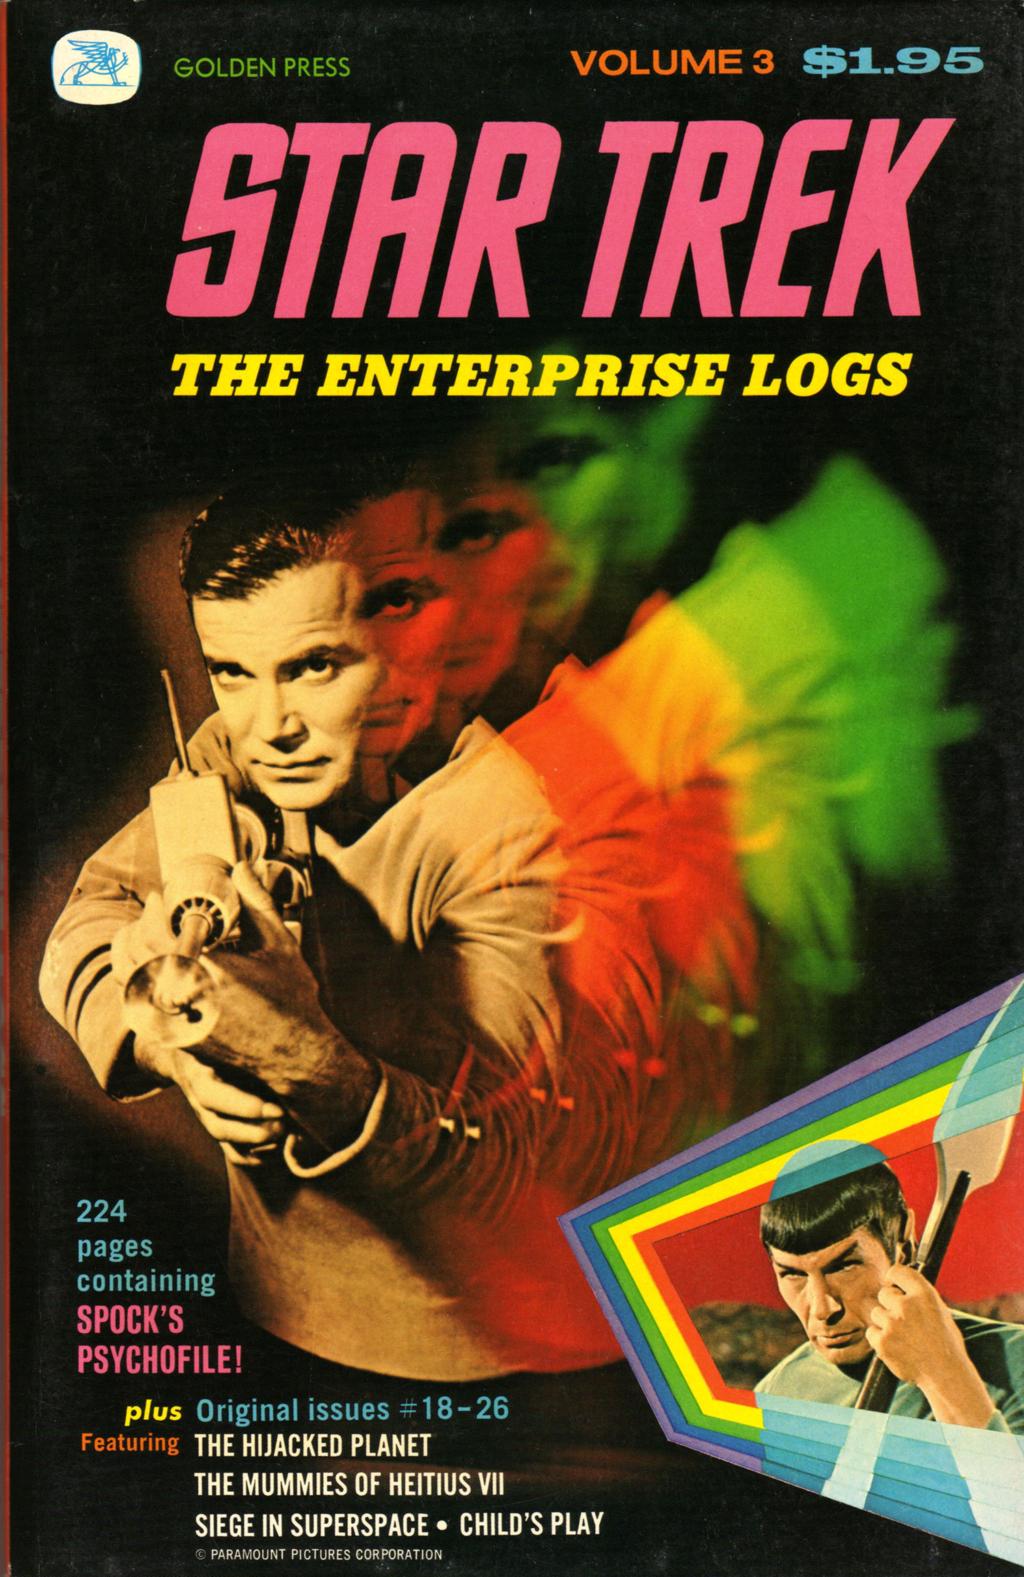 File:Enterprise Logs Volume3.jpg